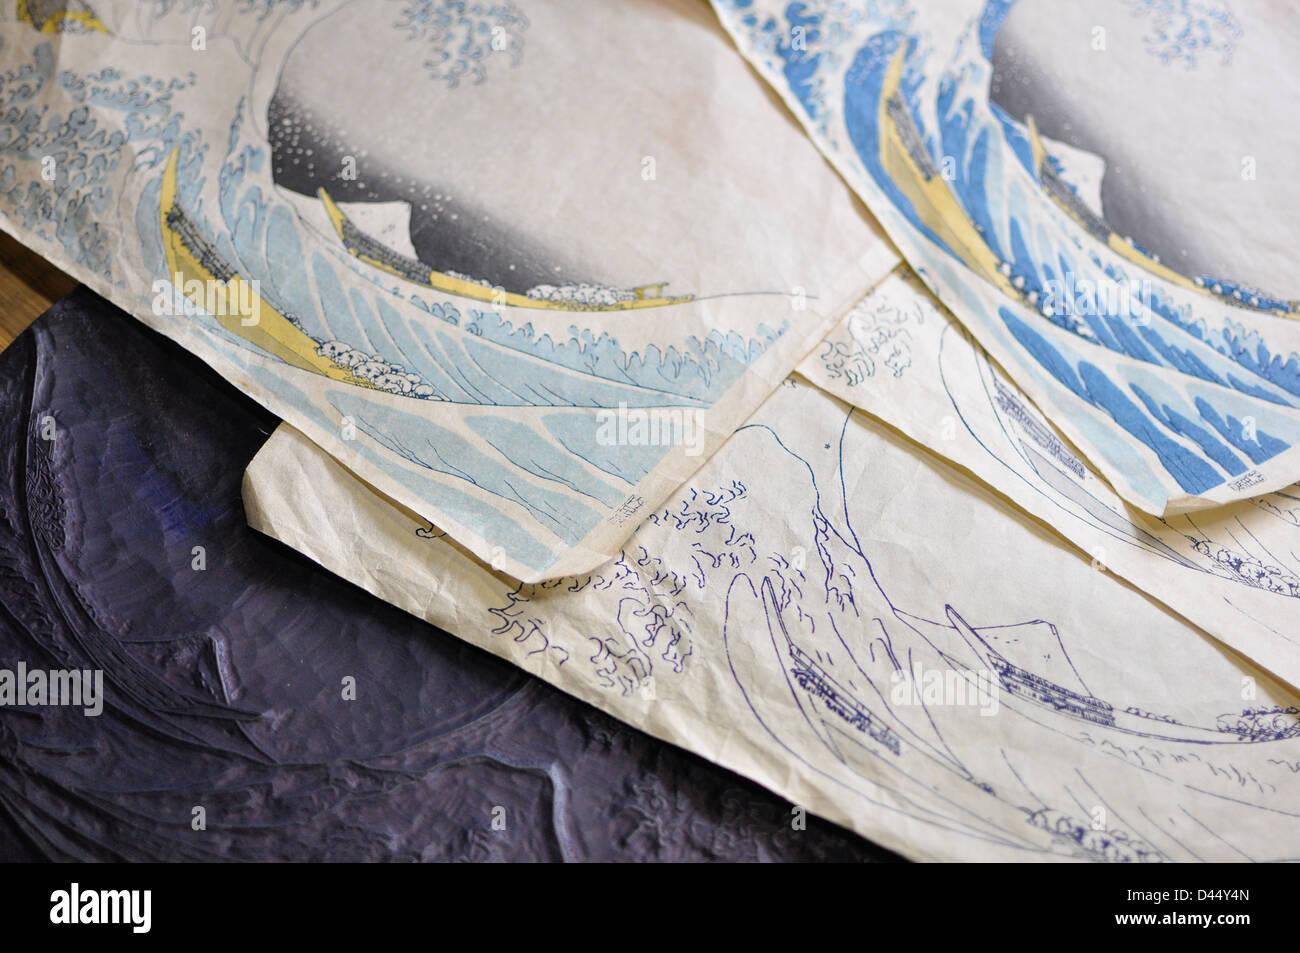 The Kyoto workshop of Japanese ukiyo-e artist and woodblock printer Mamoru Ichimura. - Stock Image